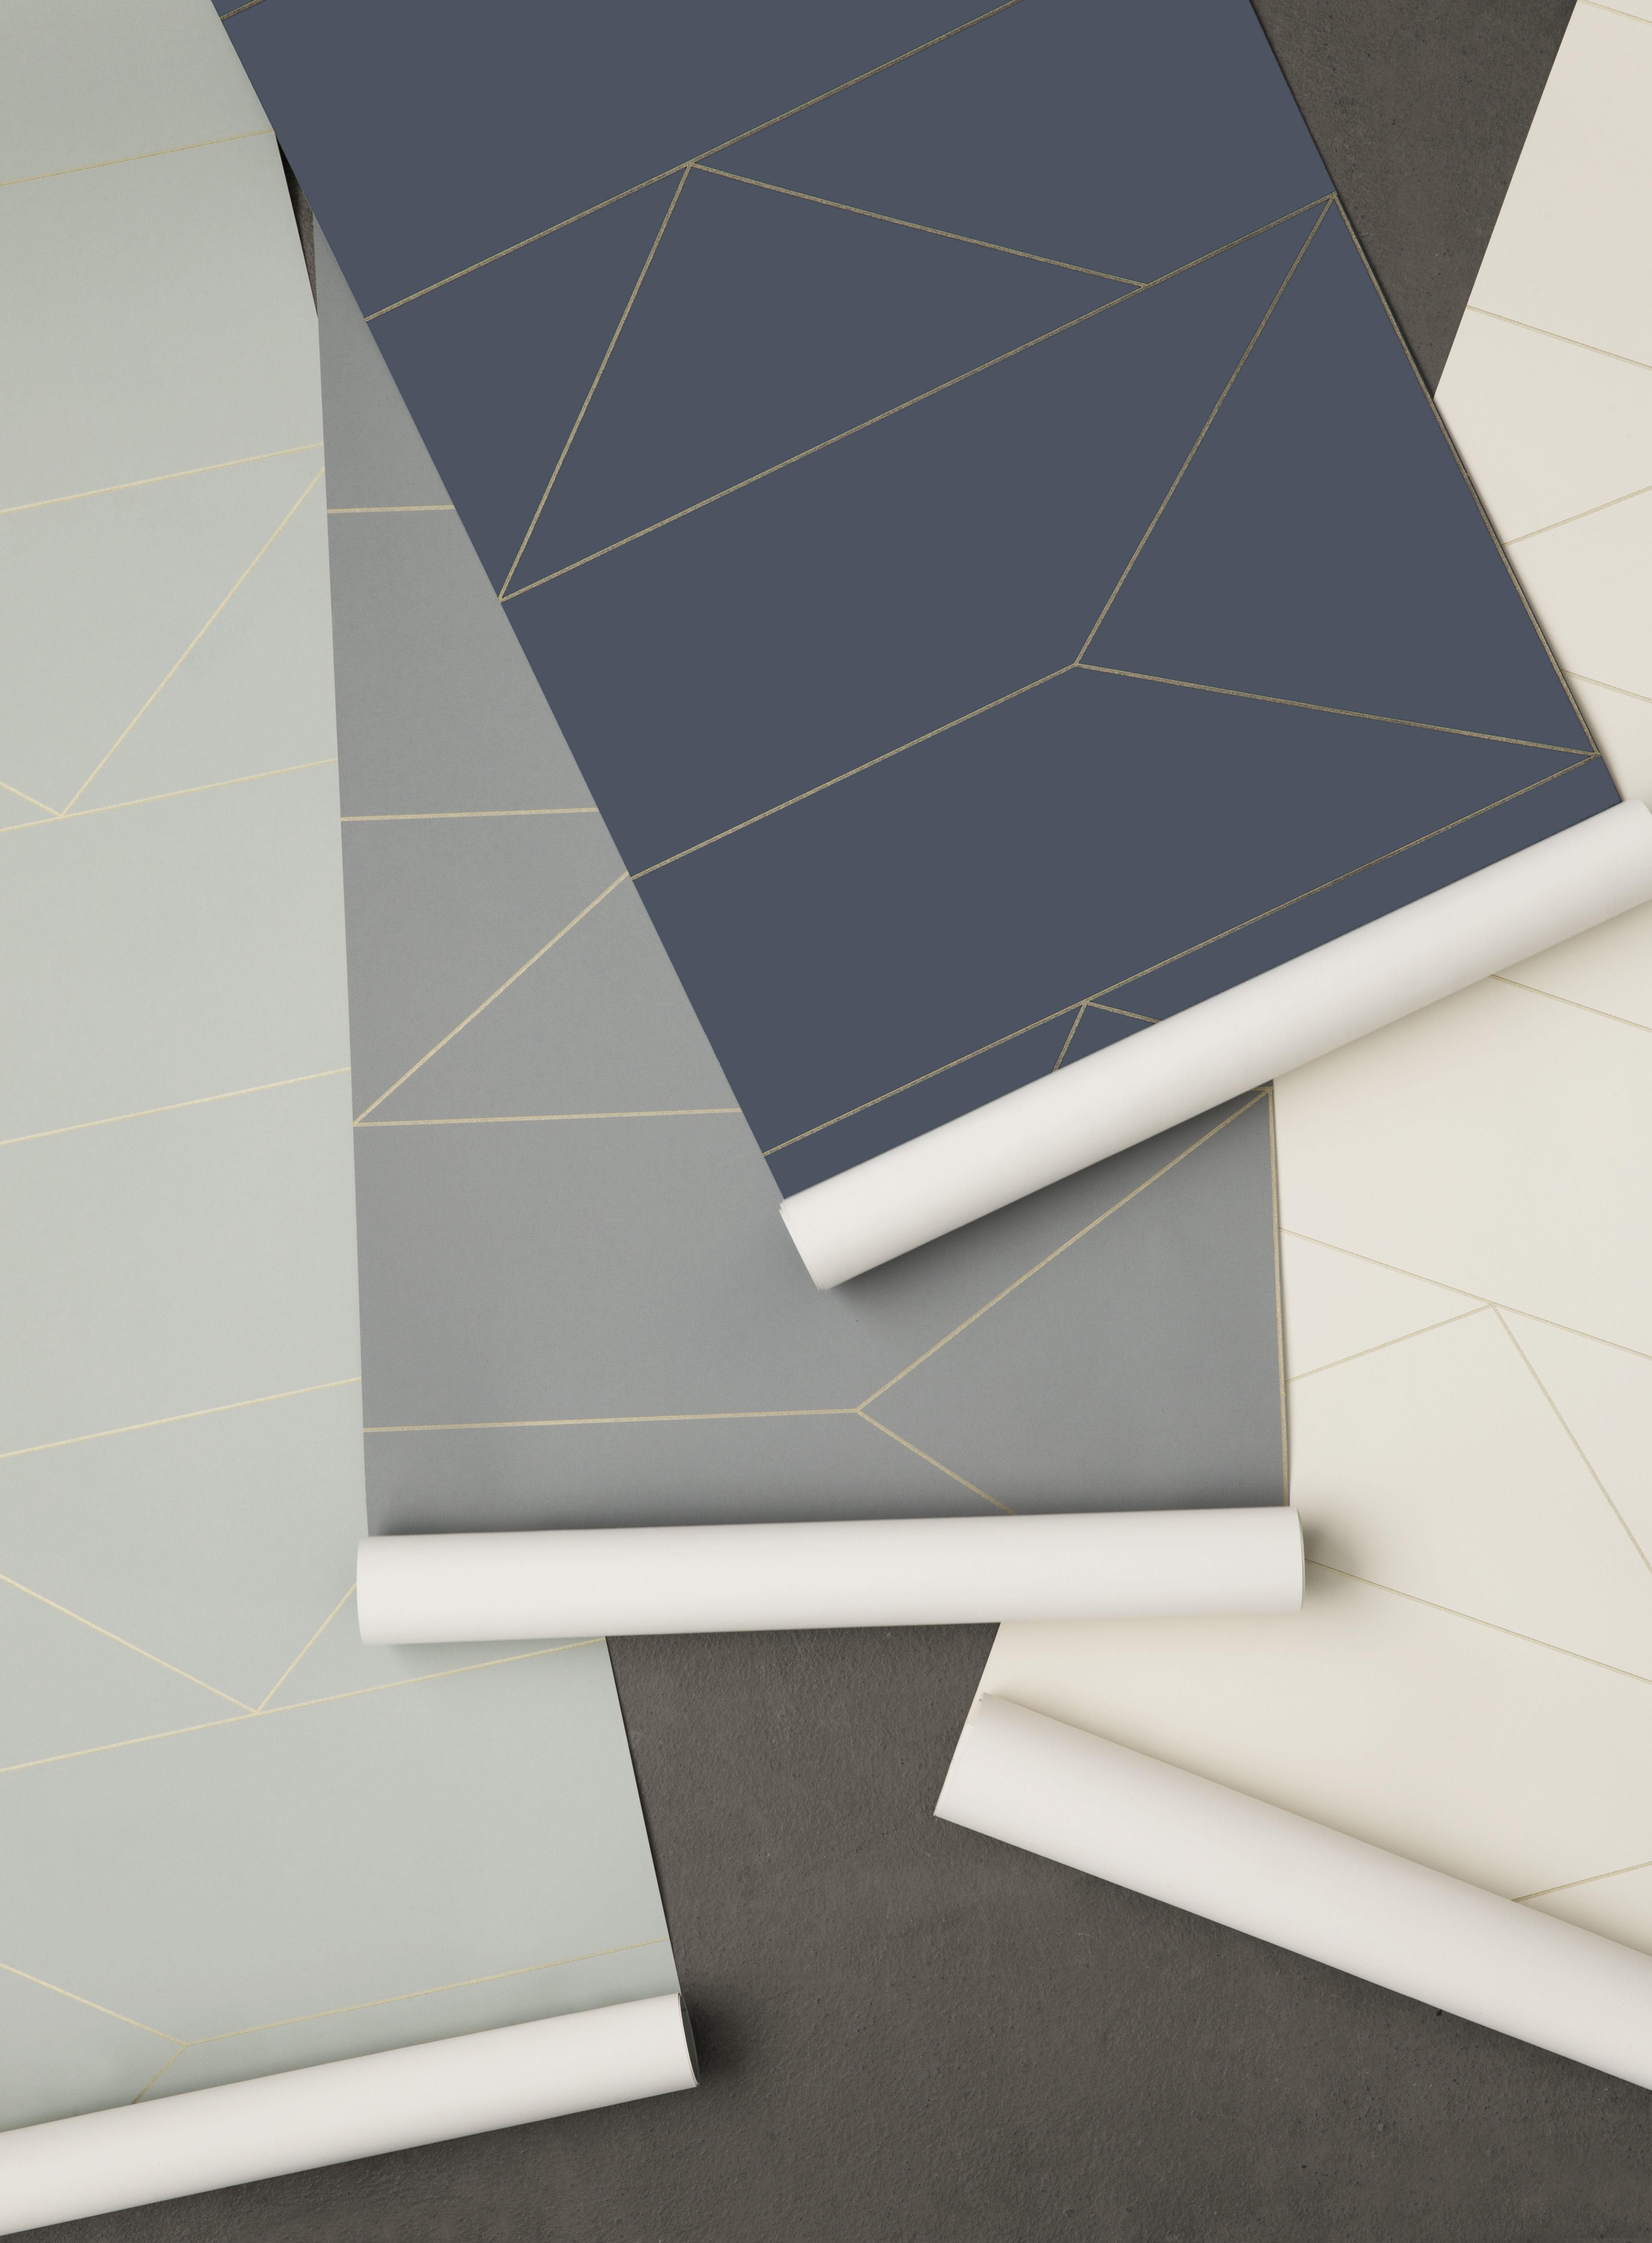 Papier Peint Ferm Living Lines L 53 Cm Bleu Or Made In Design